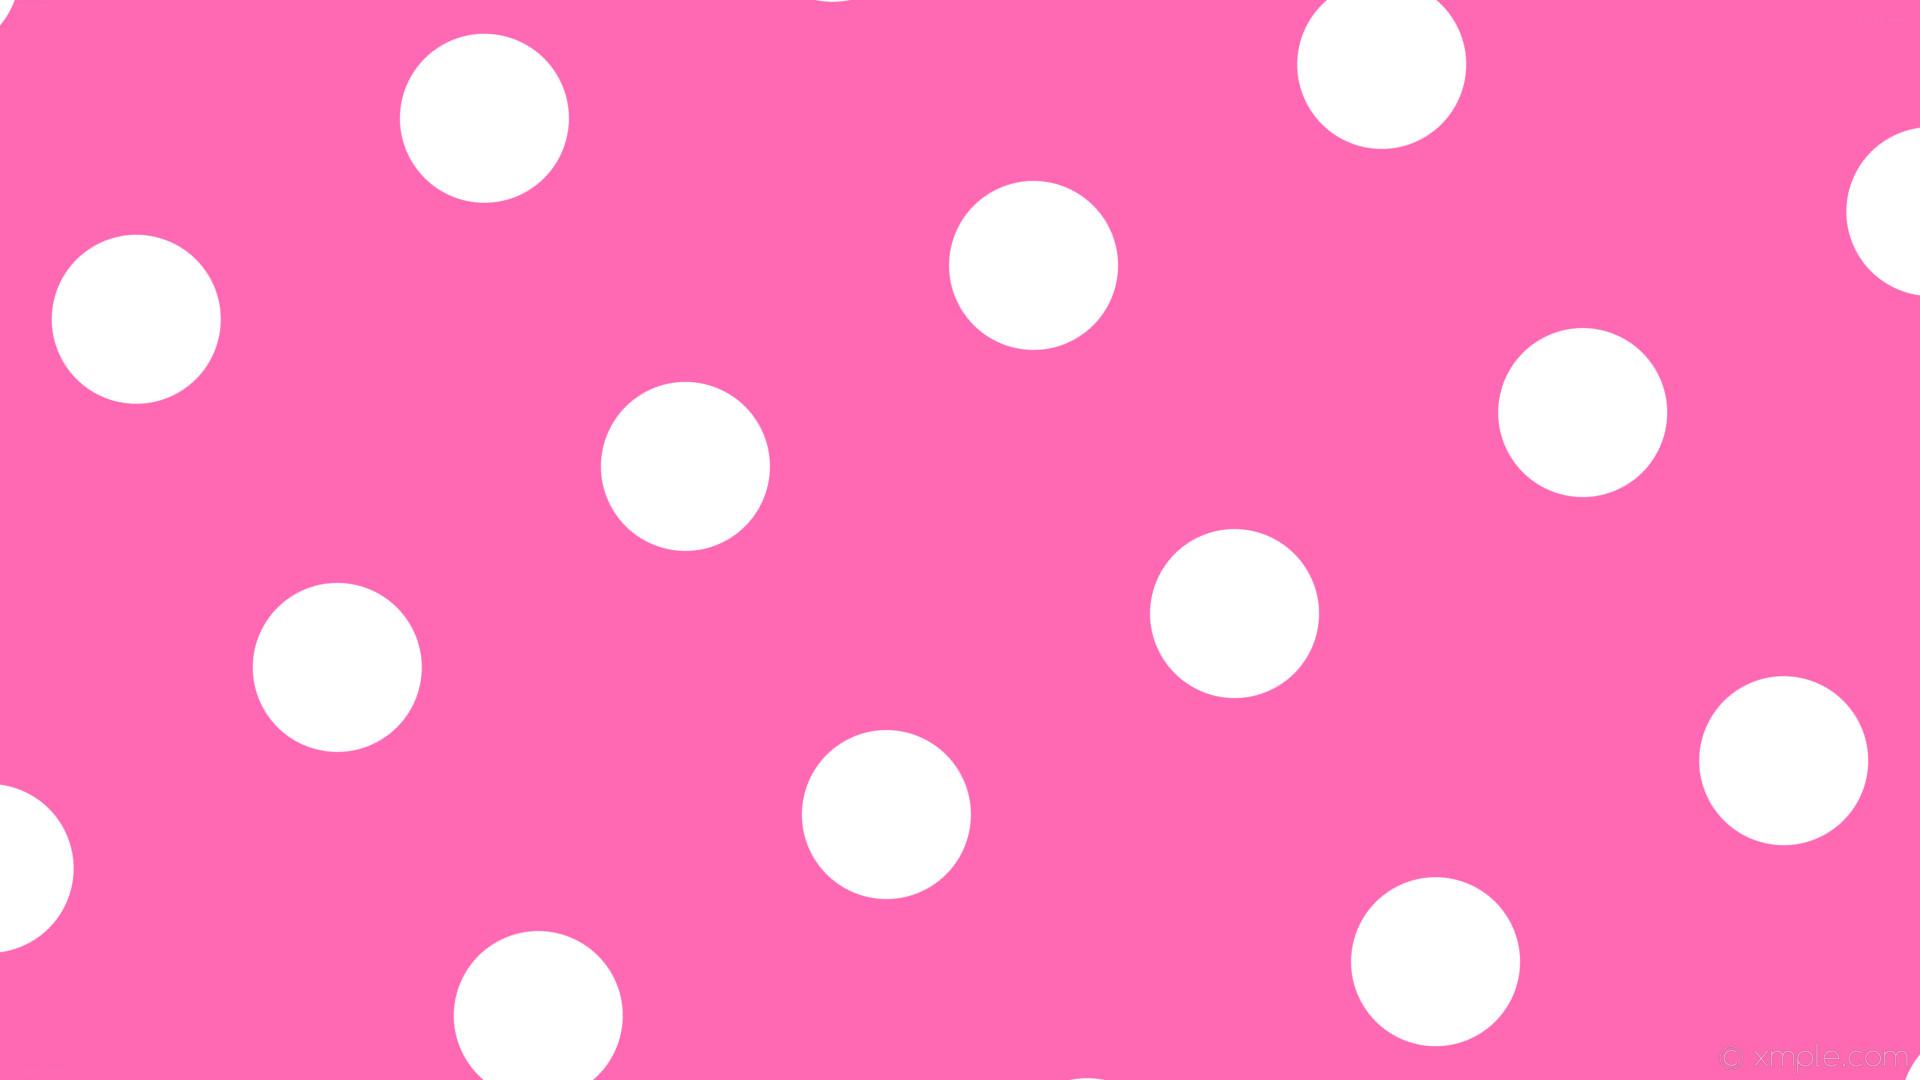 wallpaper polka dots spots pink white hot pink #ff69b4 #ffffff 30° 169px  402px